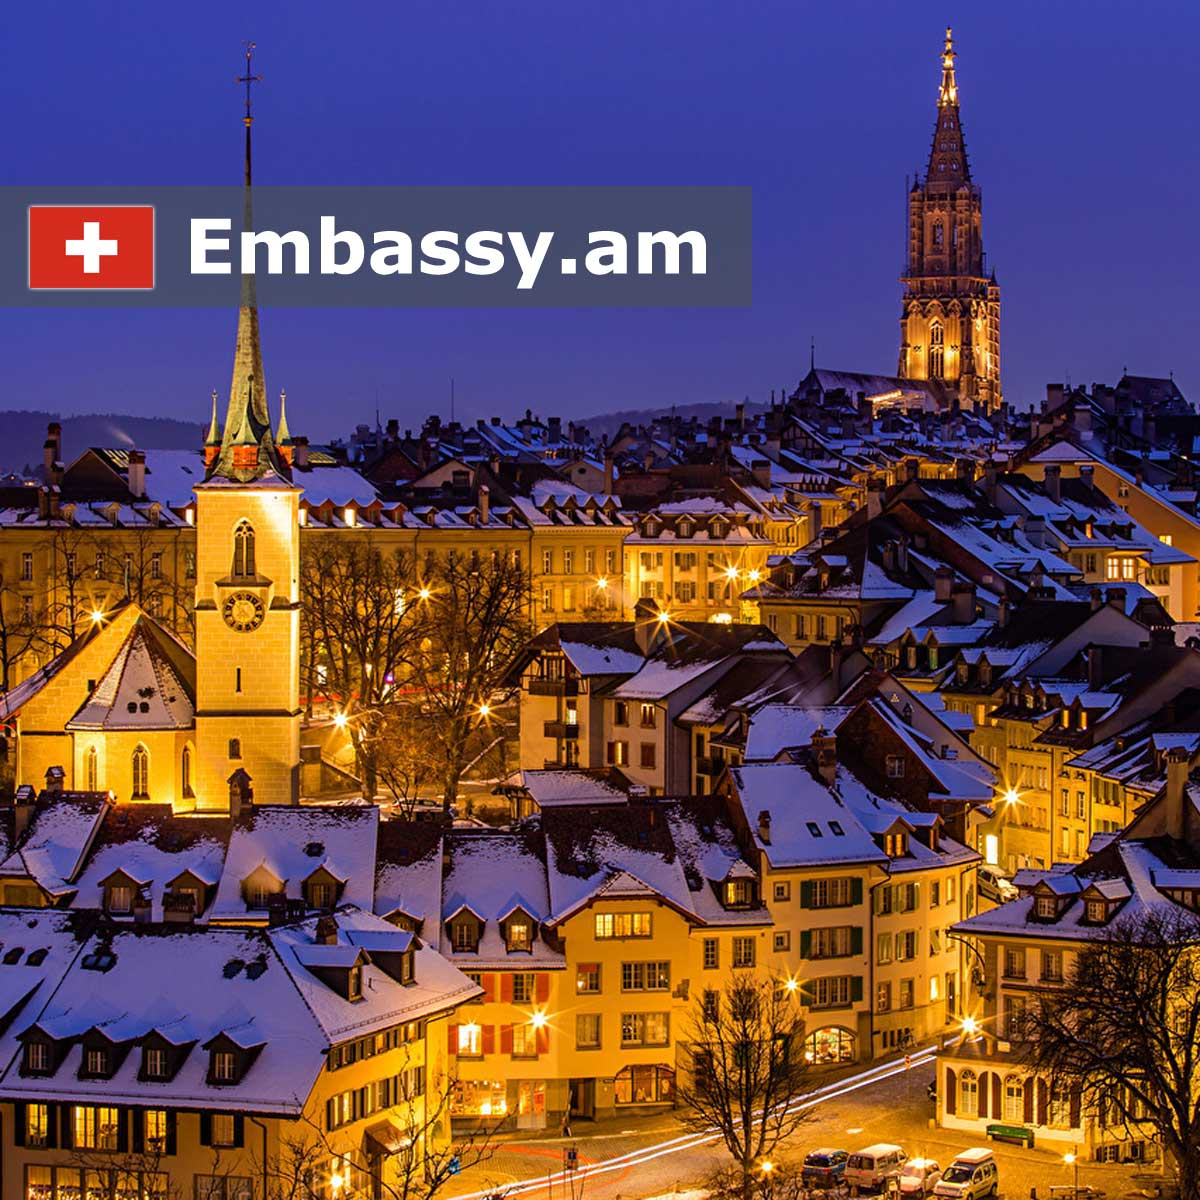 Bern - Hotels in Switzerland - Embassy.am